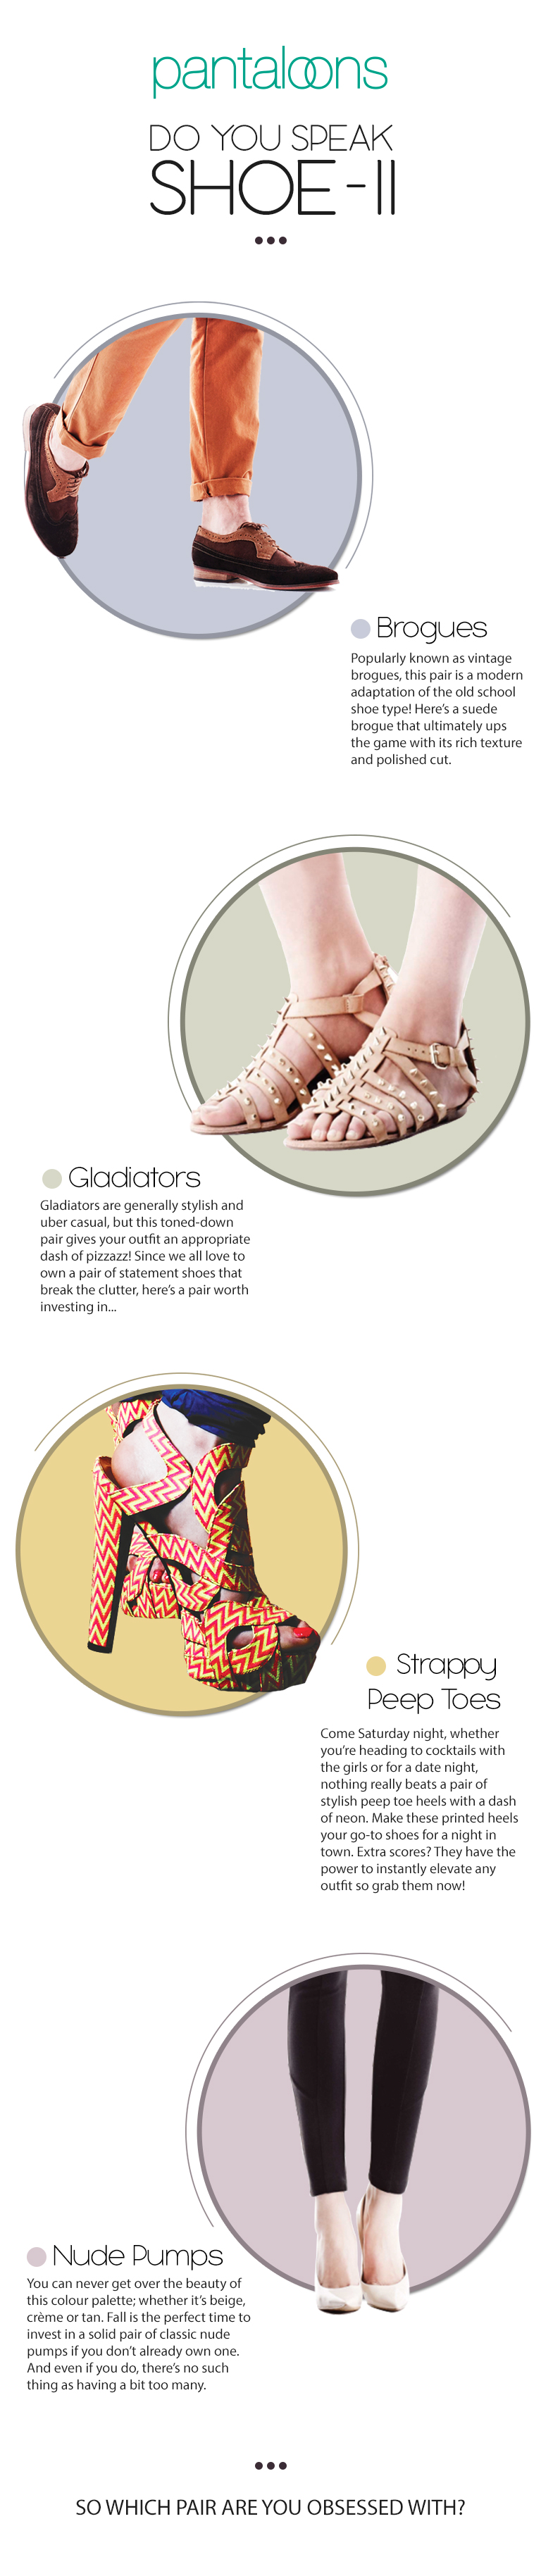 Do You Speak Shoe- II - Pantaloons Fashion